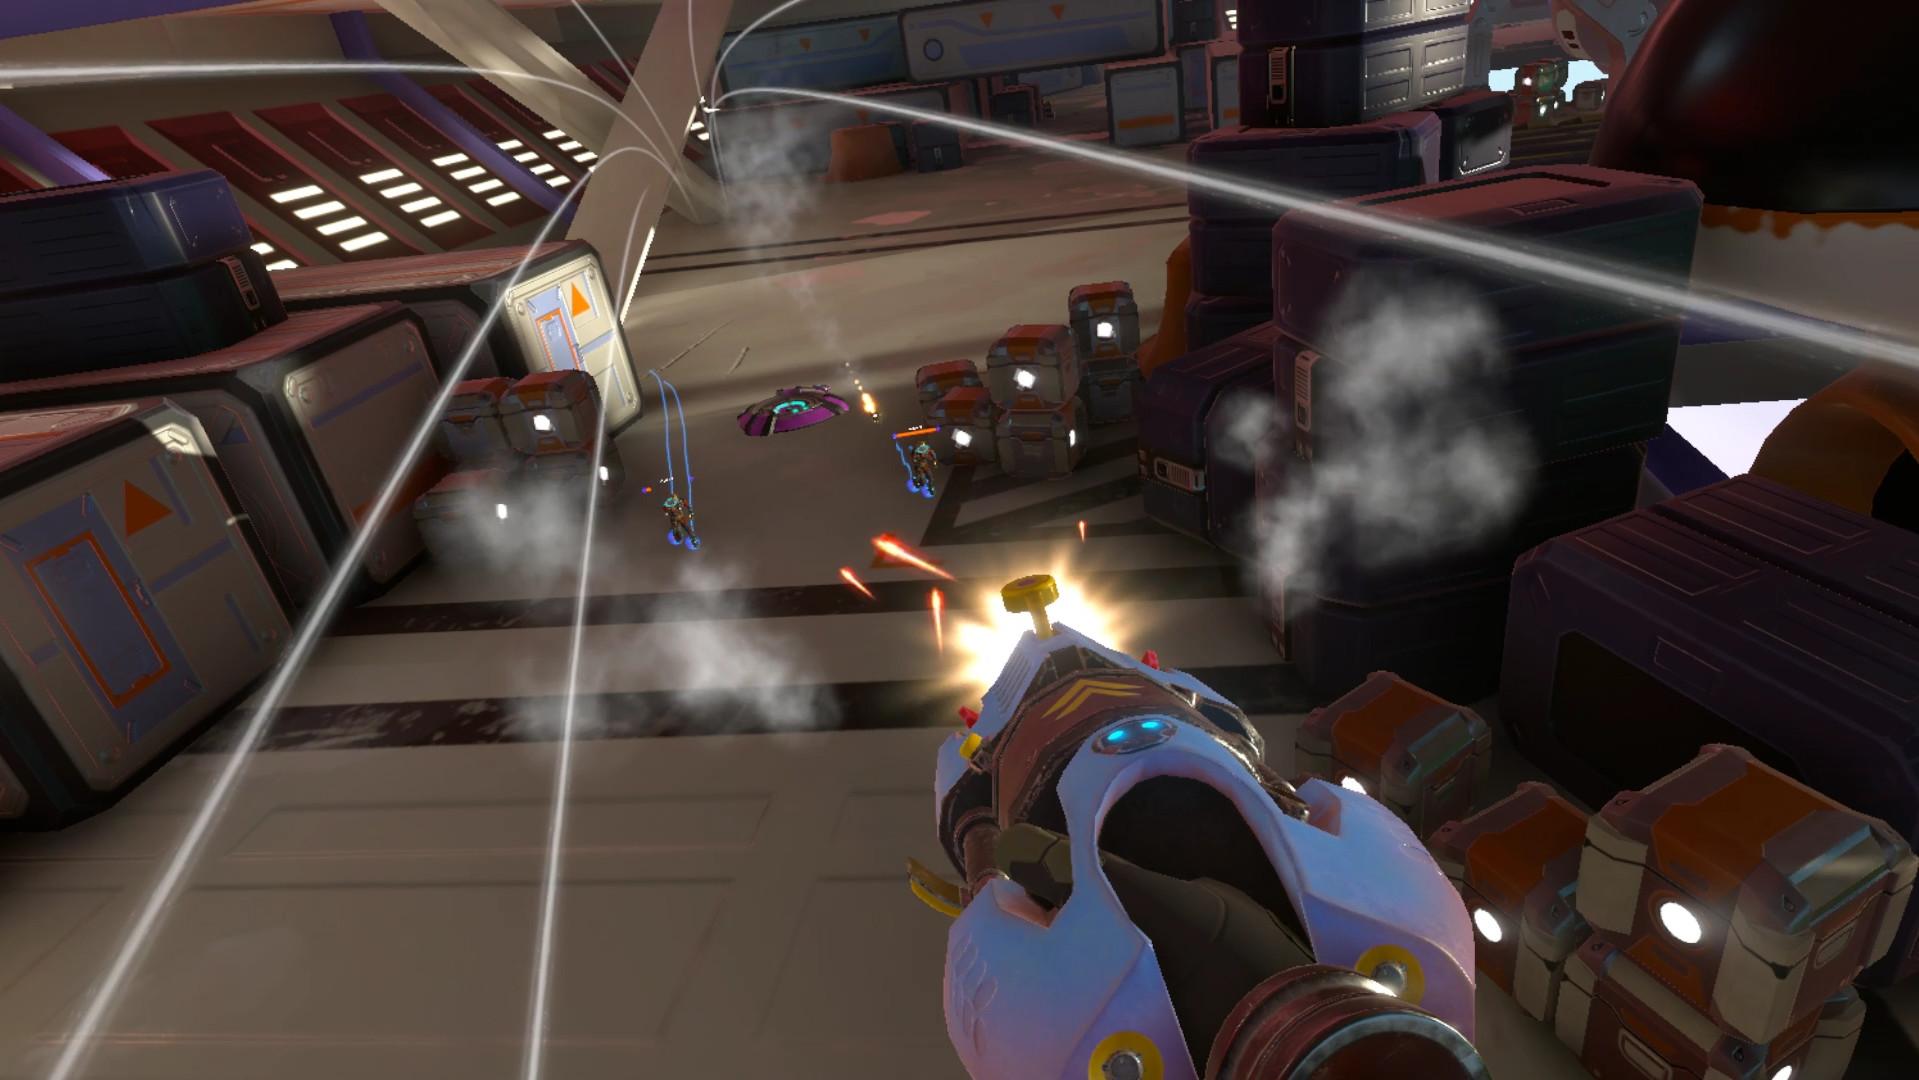 Oval-Oculus-Rift-HTC-Vive-Windows-VR-SteamVR-Multiplayer-VR-Shooter